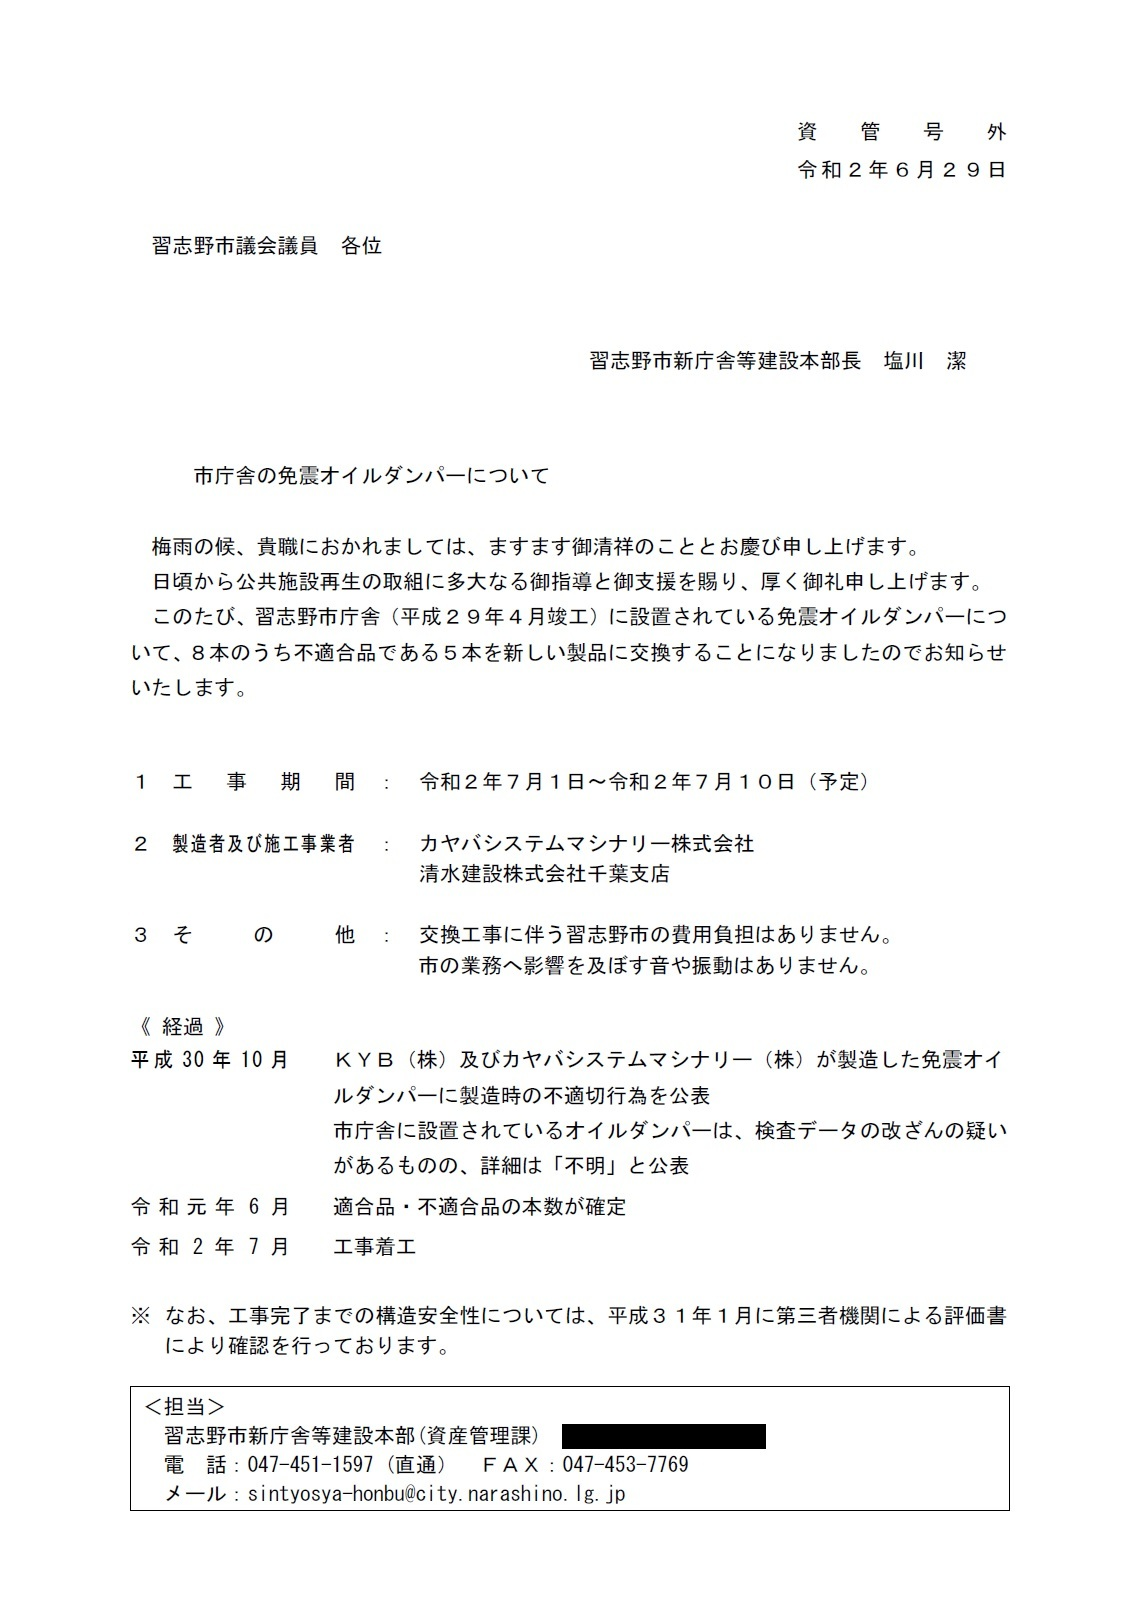 KYBデータ改ざんから2年・・・習志野市庁舎の免震オイルダンパー交換工事_c0236527_20041907.jpg